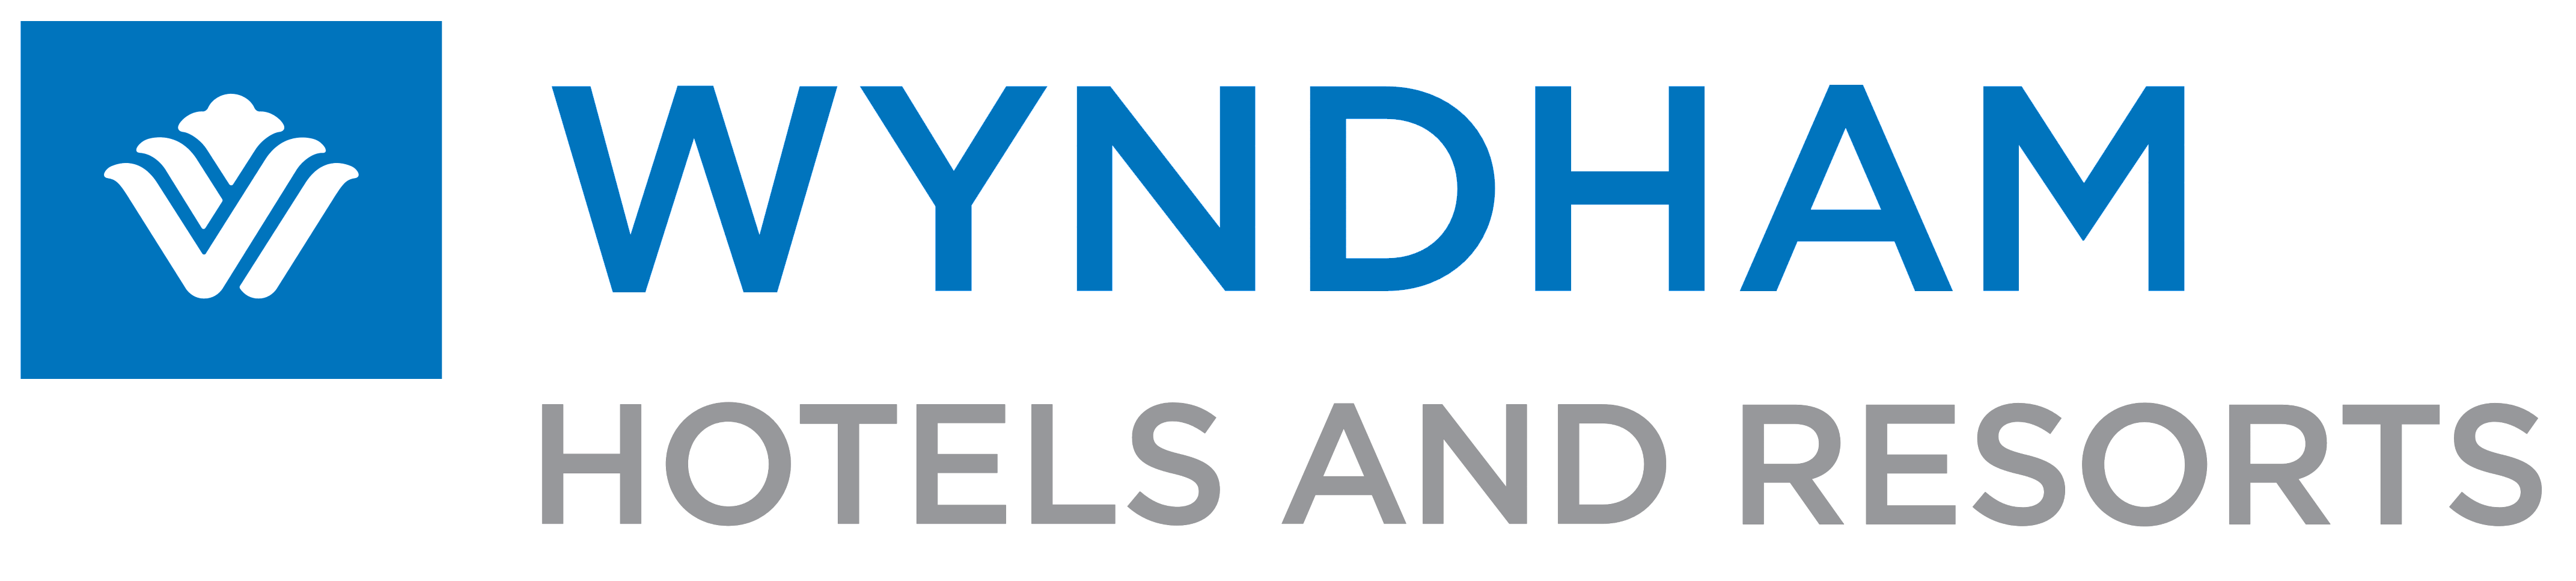 Wyndham Resports